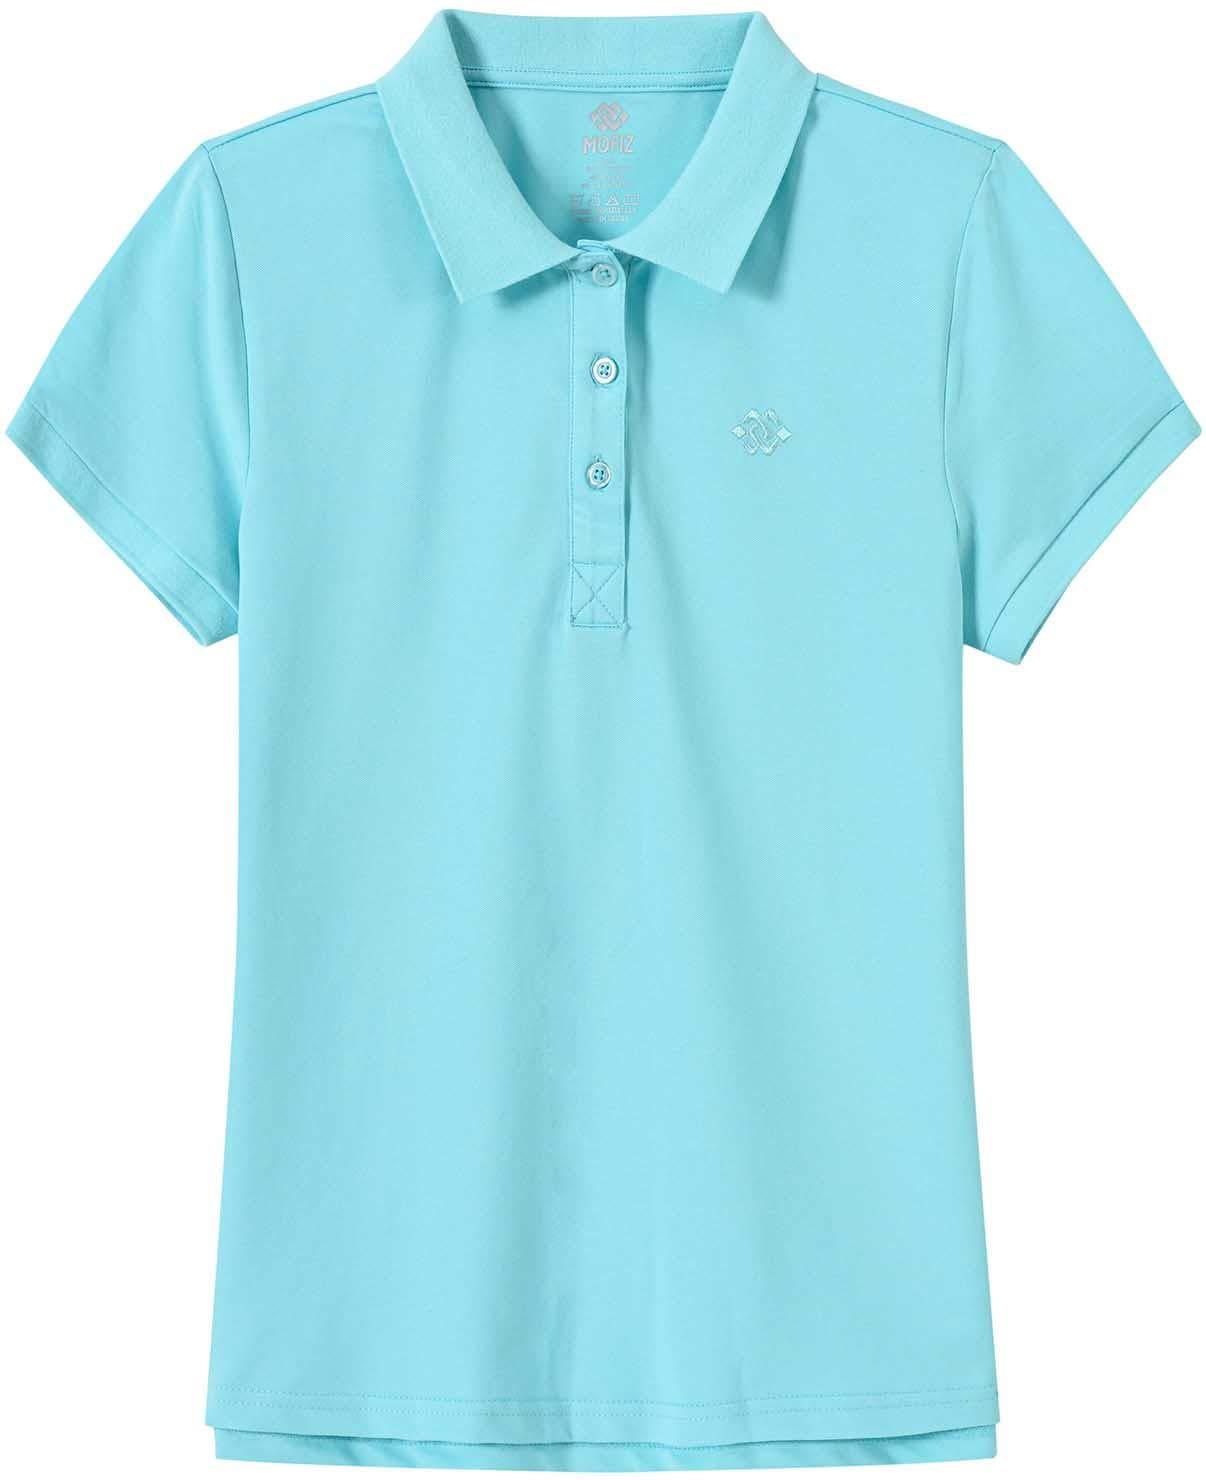 AjezMax Womens Polo Shirt Golf Sport Short Basic Quick Dry Shirt Casual